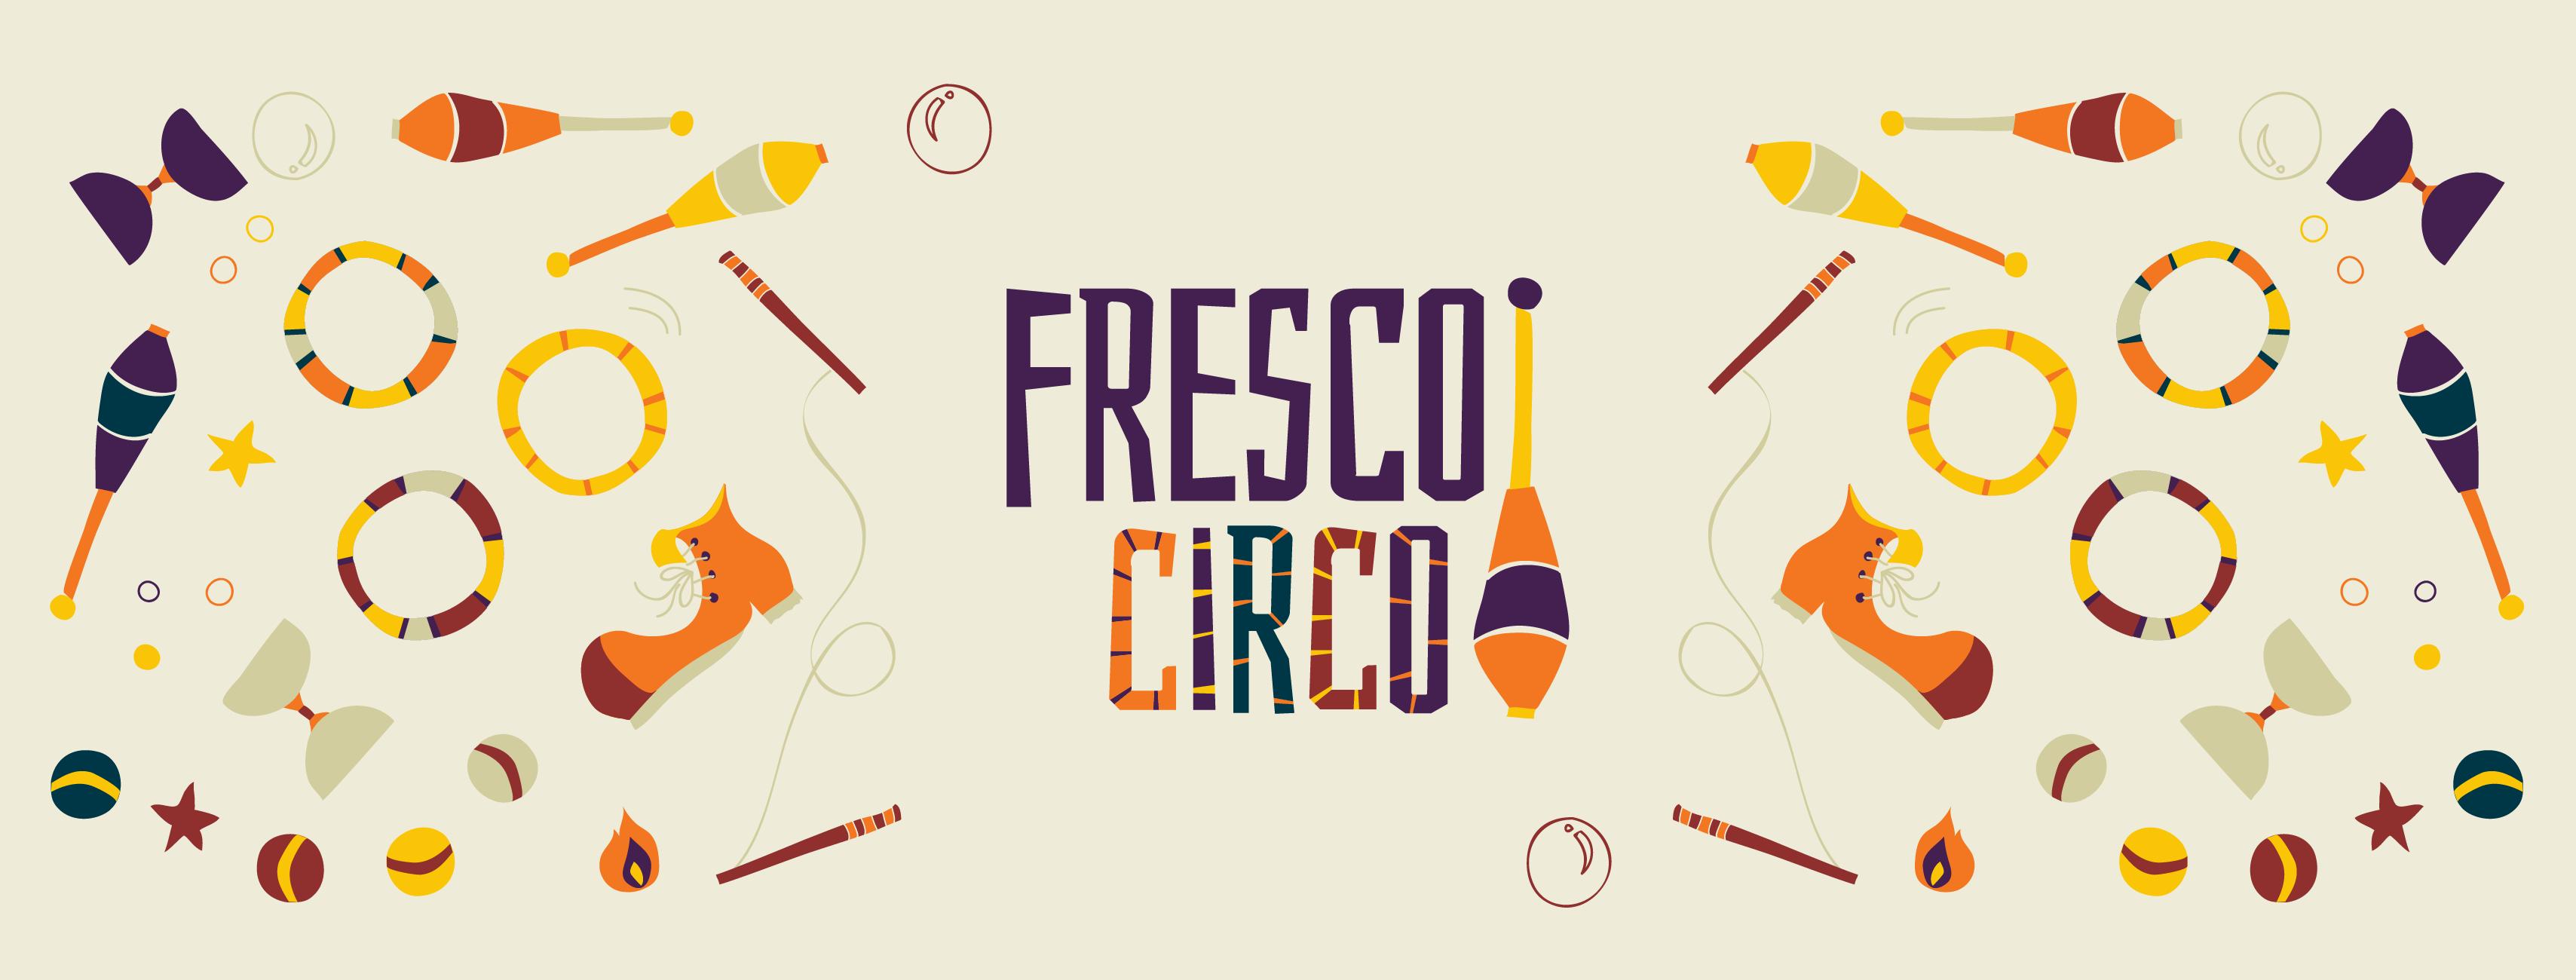 Fresco Circo